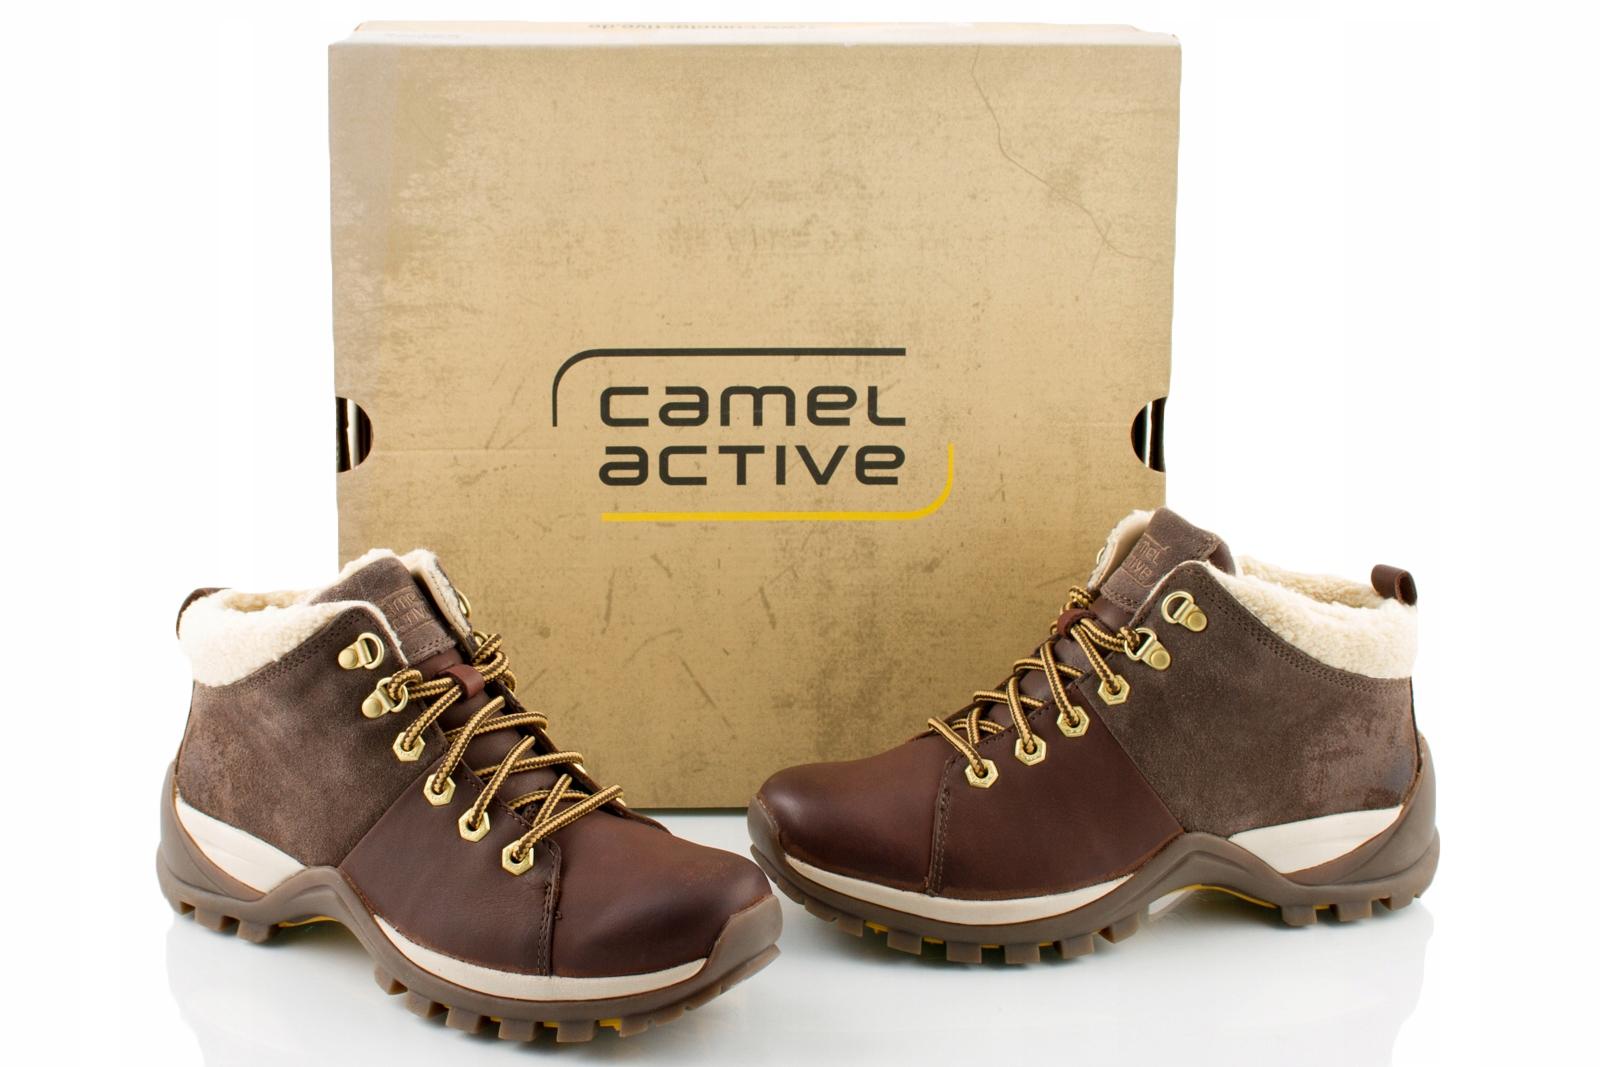 cc568c566a472 CAMEL ACTIVE buty damskie SKÓRZANE ocieplane r 38 - 7048996836 ...